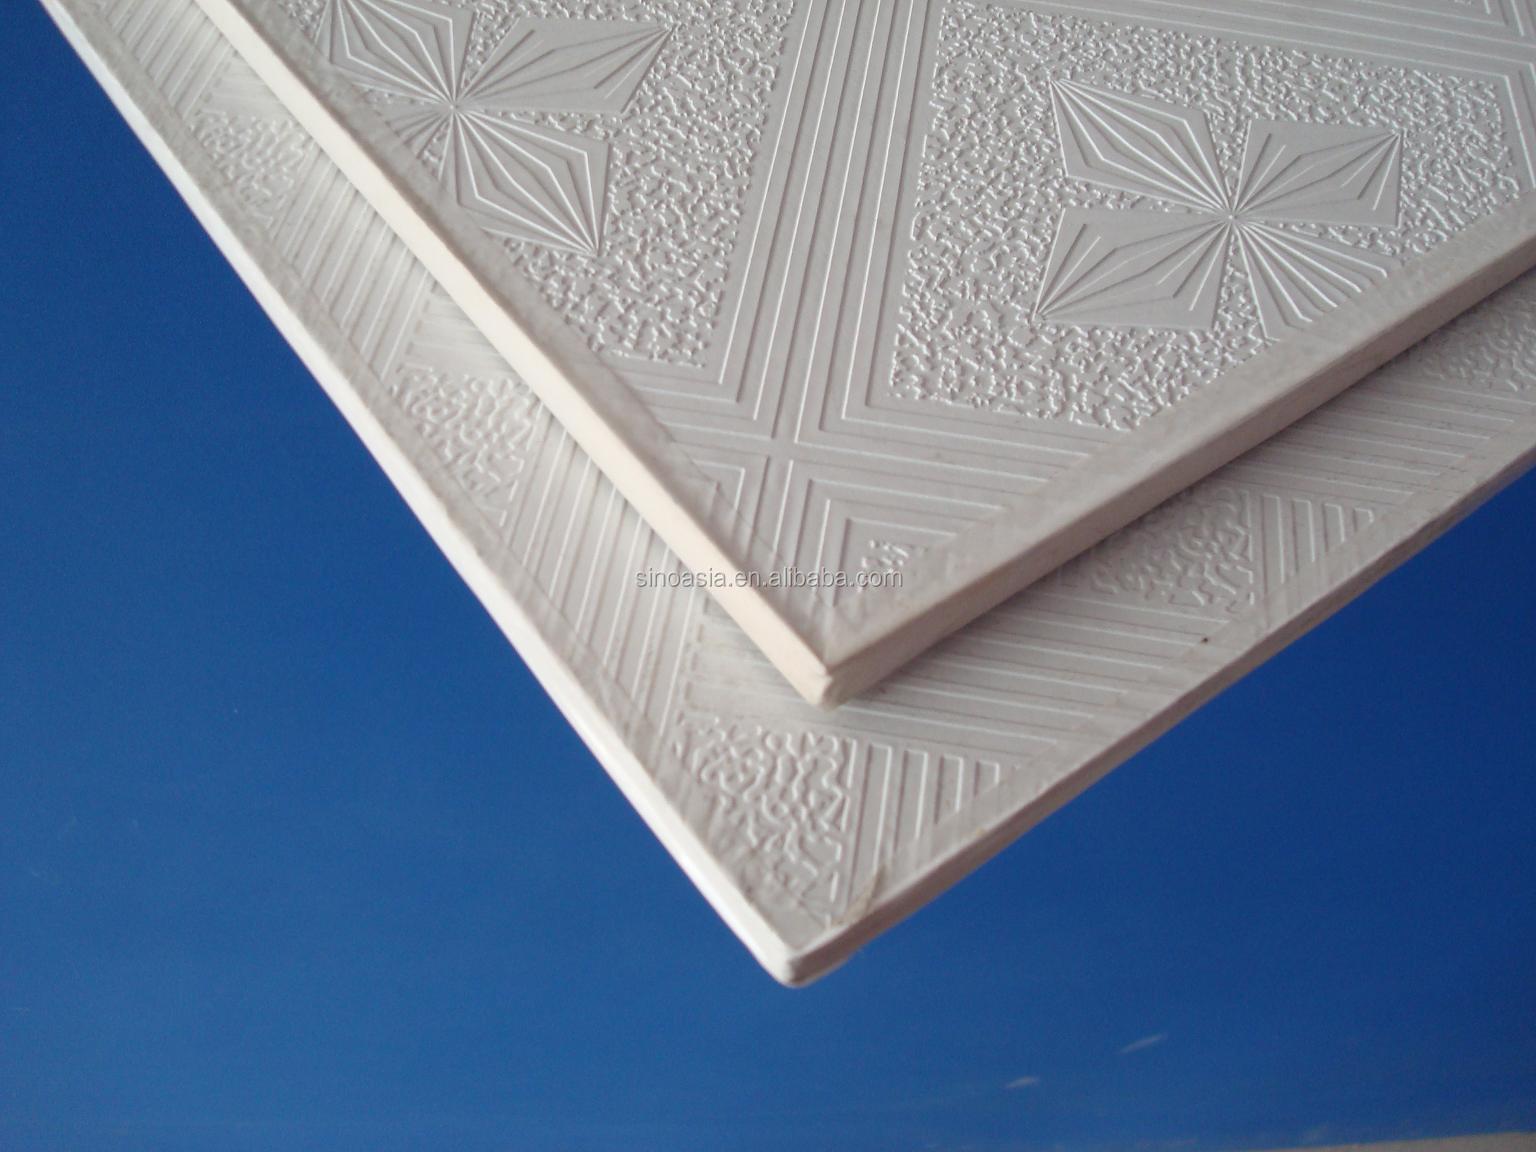 Waterproof 60x60 pvc gypsum ceiling tiles with aluminum foil buy waterproof 60x60 pvc gypsum ceiling tiles with aluminum foil dailygadgetfo Images